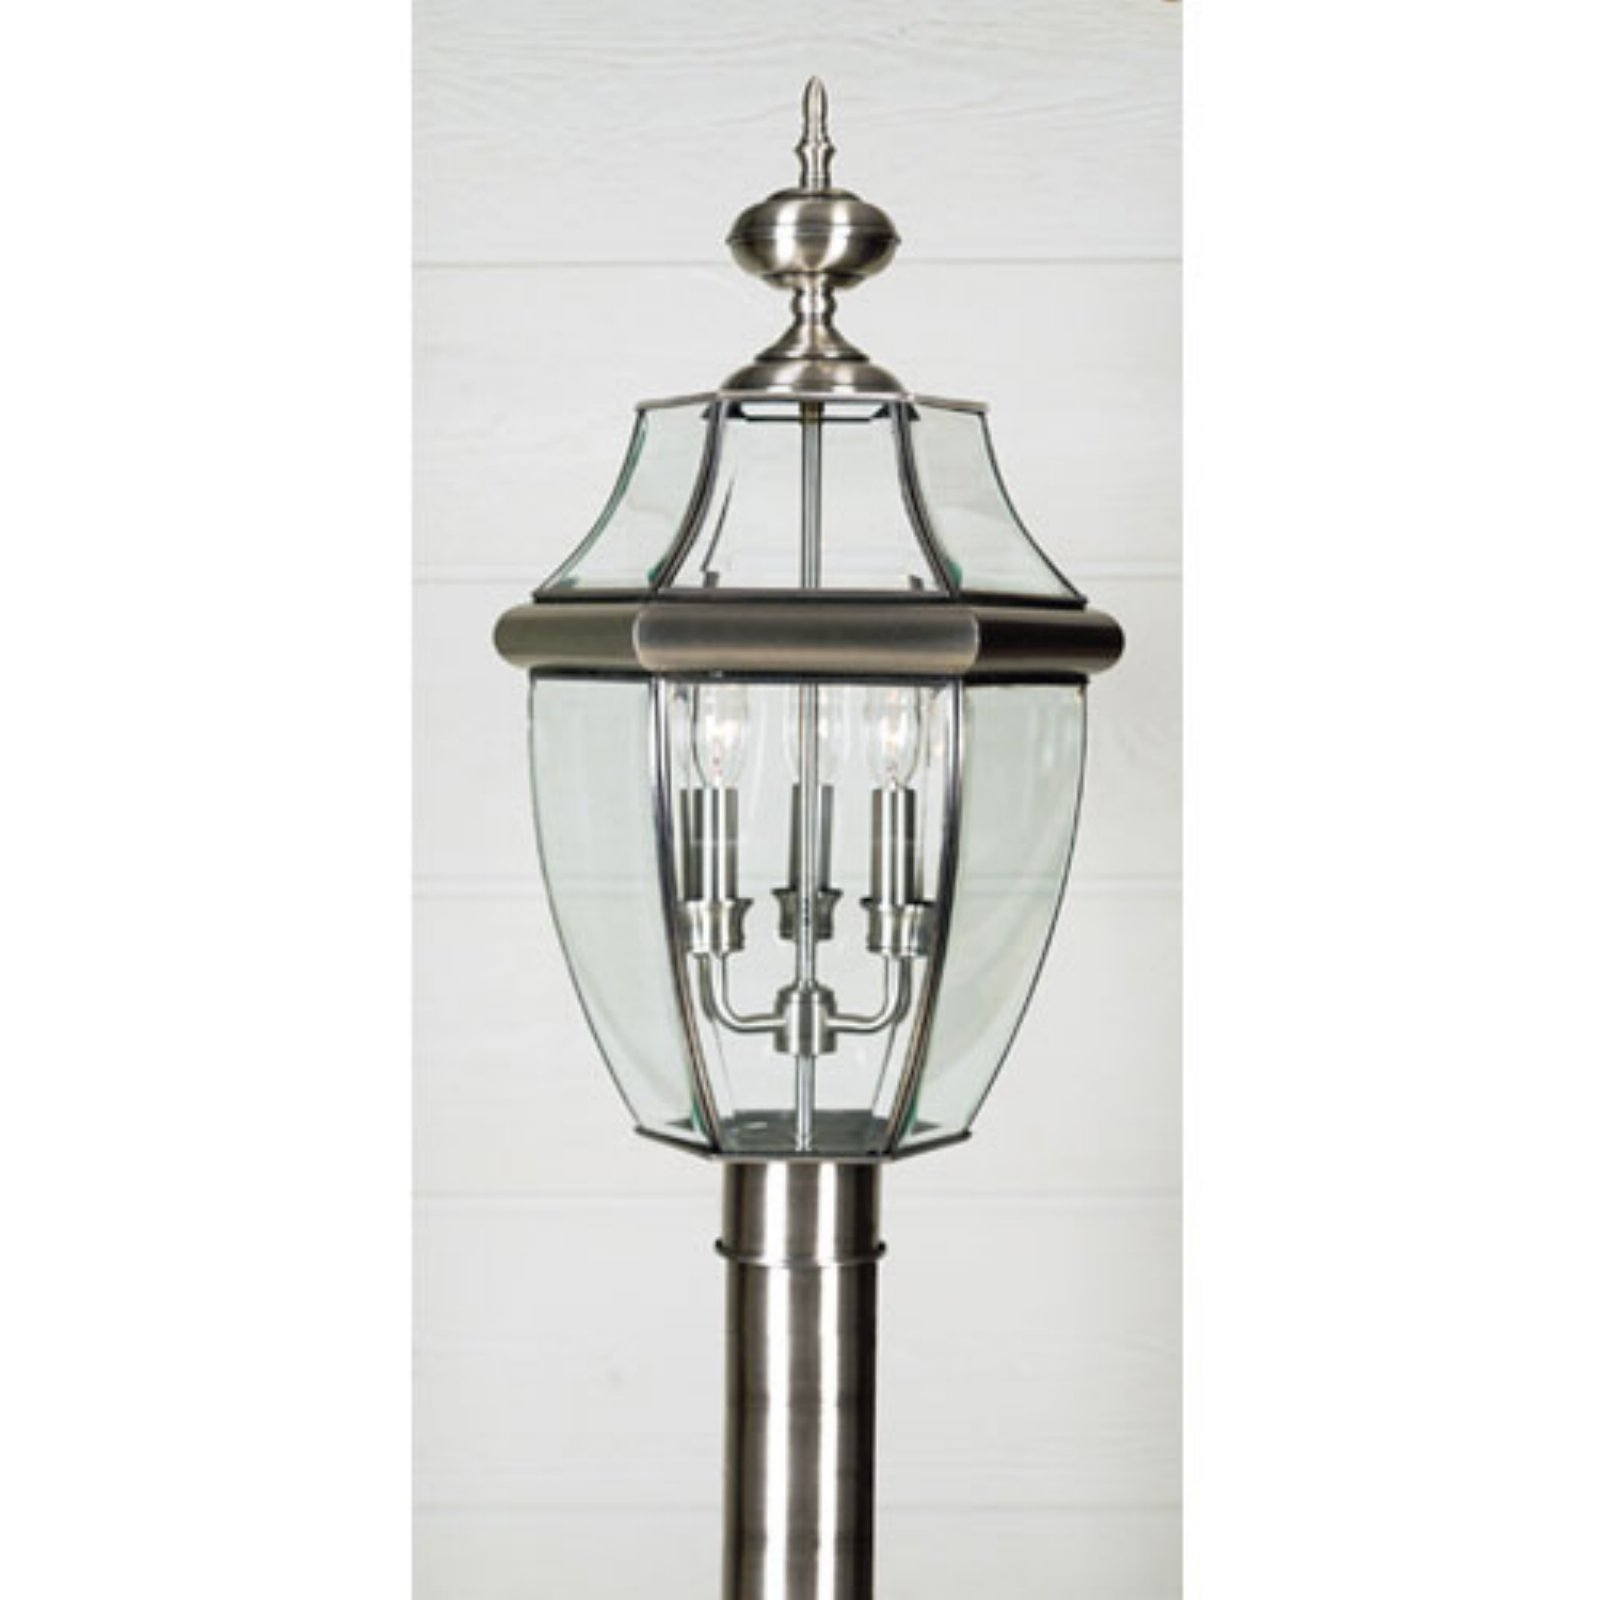 Quoizel Newbury NY9043P Outdoor Post Lantern